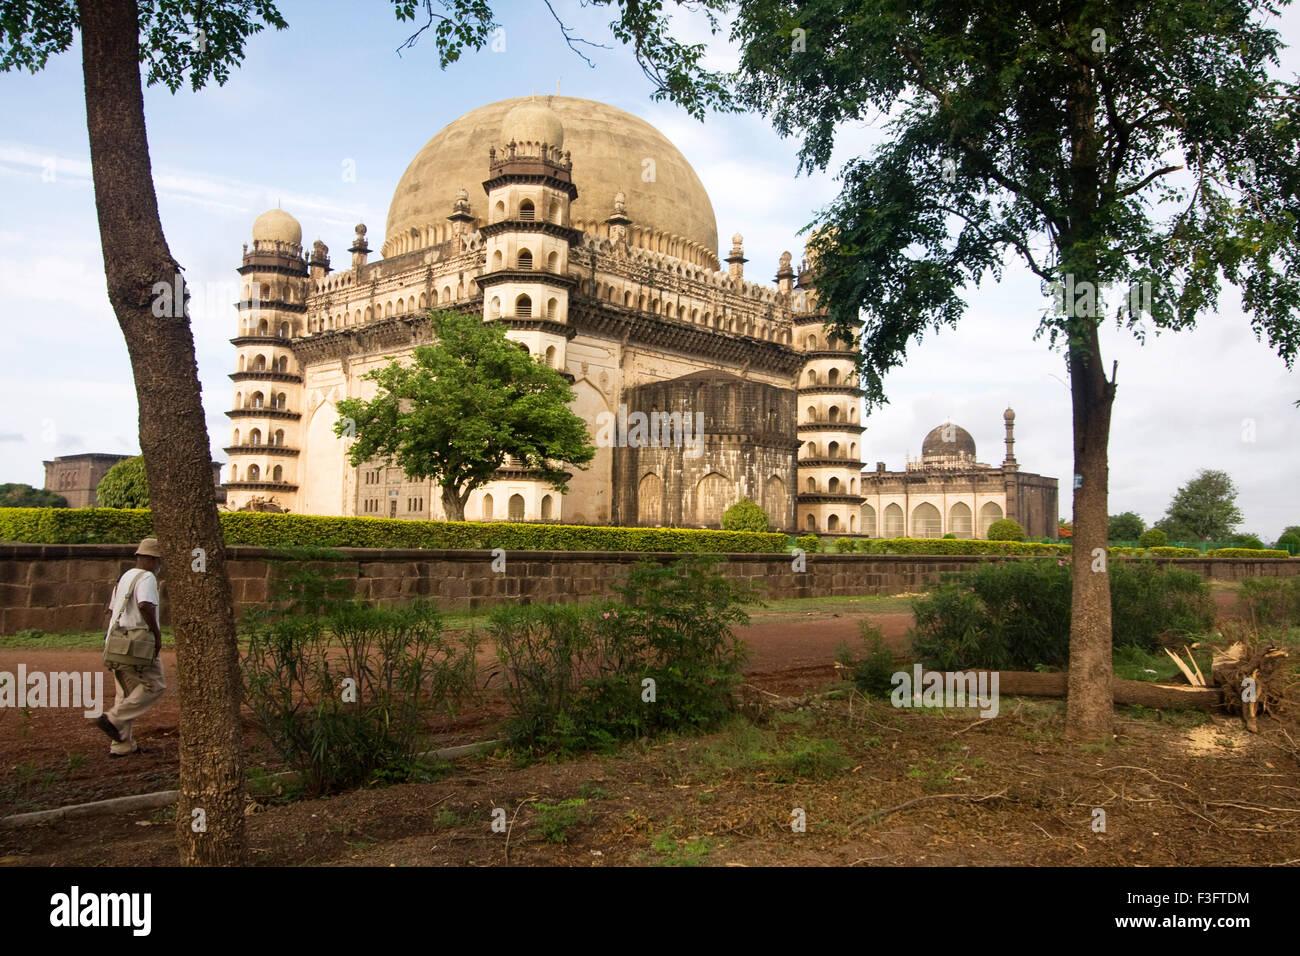 Gol gumbaz monument is the tomb of muhammad adil shah A.D.1626 1656 ; Bijapur ; Karnataka ; India - Stock Image